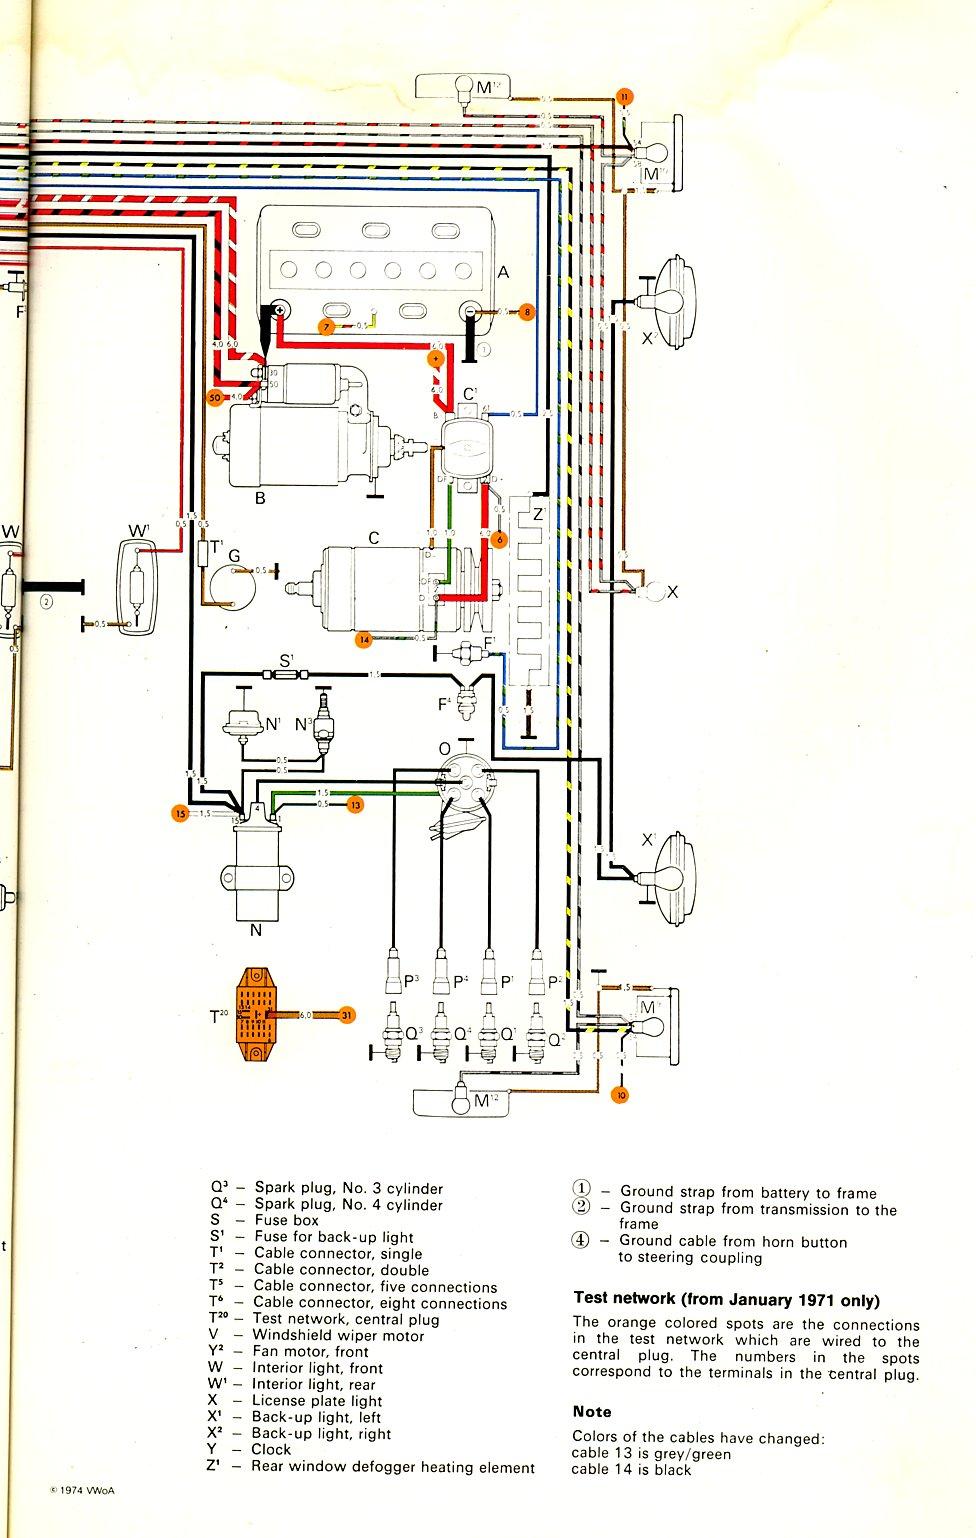 1962 C10 Wiring Diagram Pdf Solucionado Duda Electrica Alternador O Dinamo